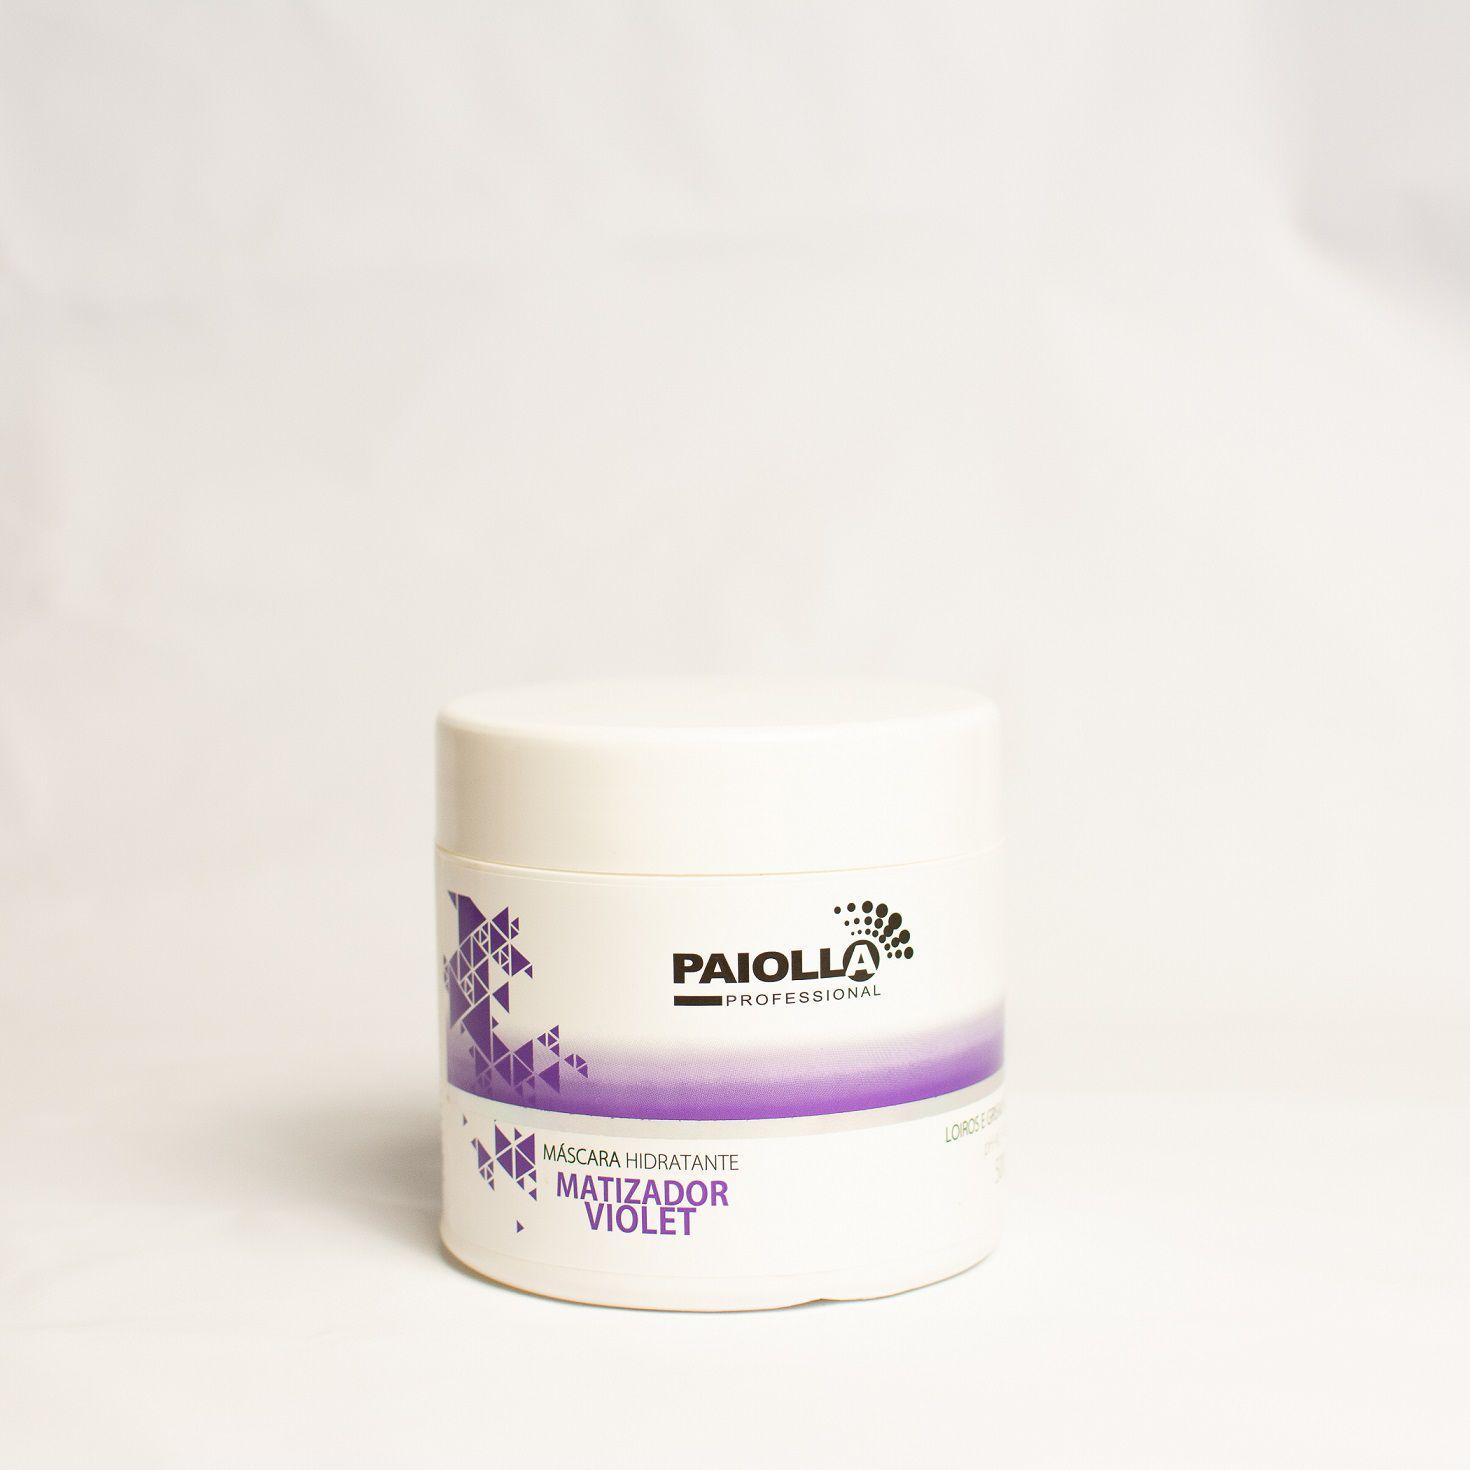 Máscara Hidratante - Matizador Violet - 500g